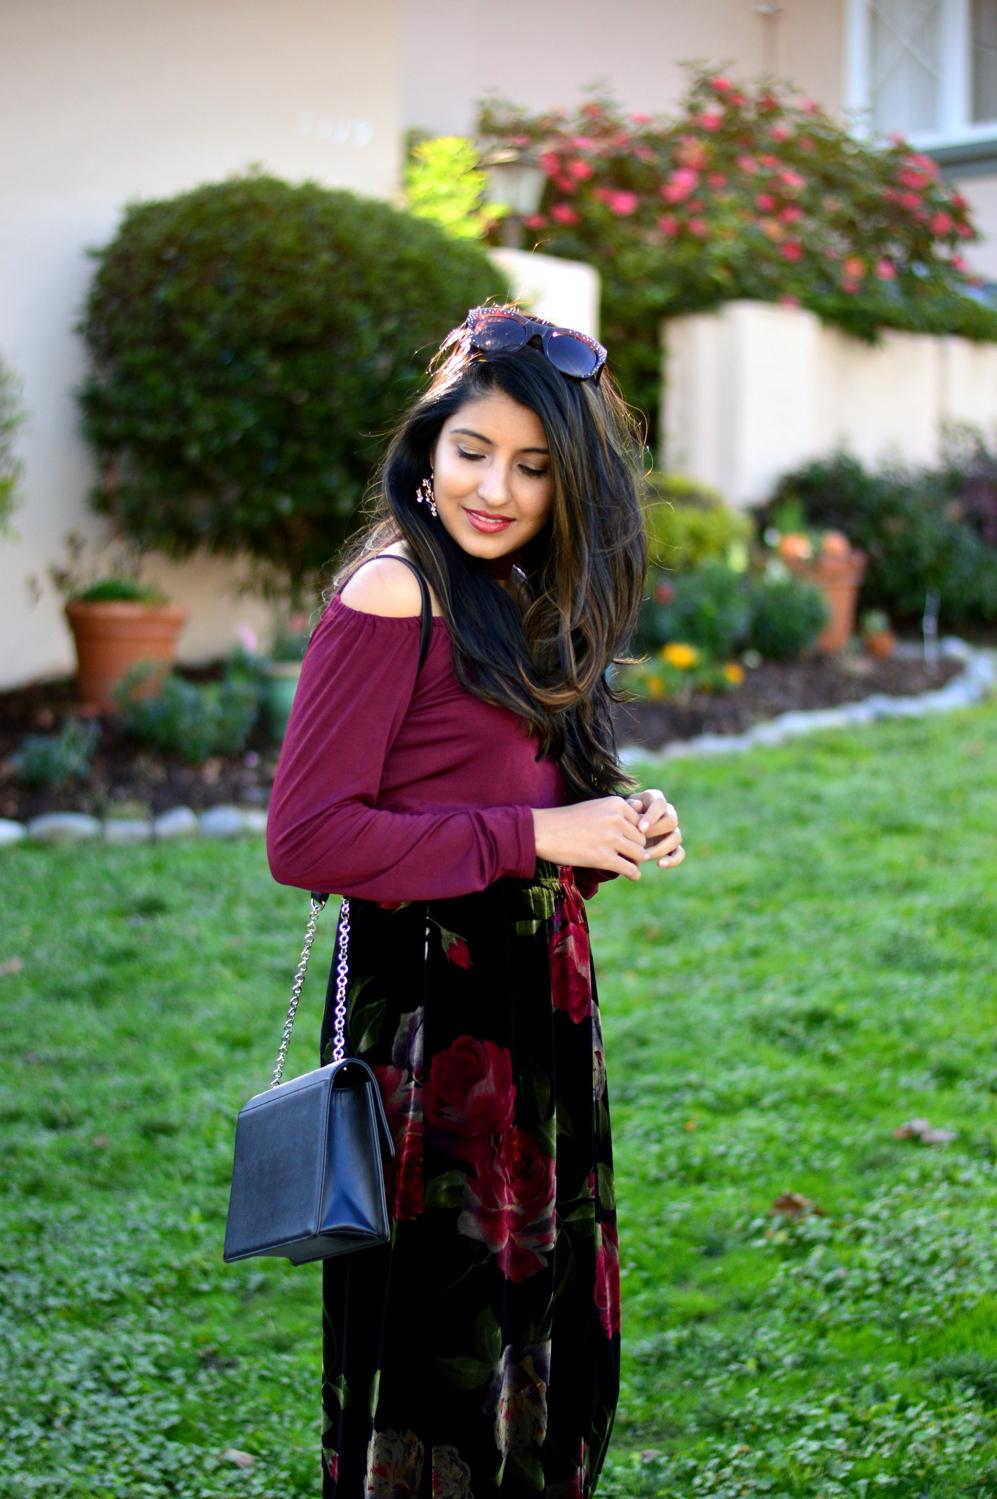 velvet-floral-skirt-choker-burgundy-top-party-outfit-NYE-blogger 6